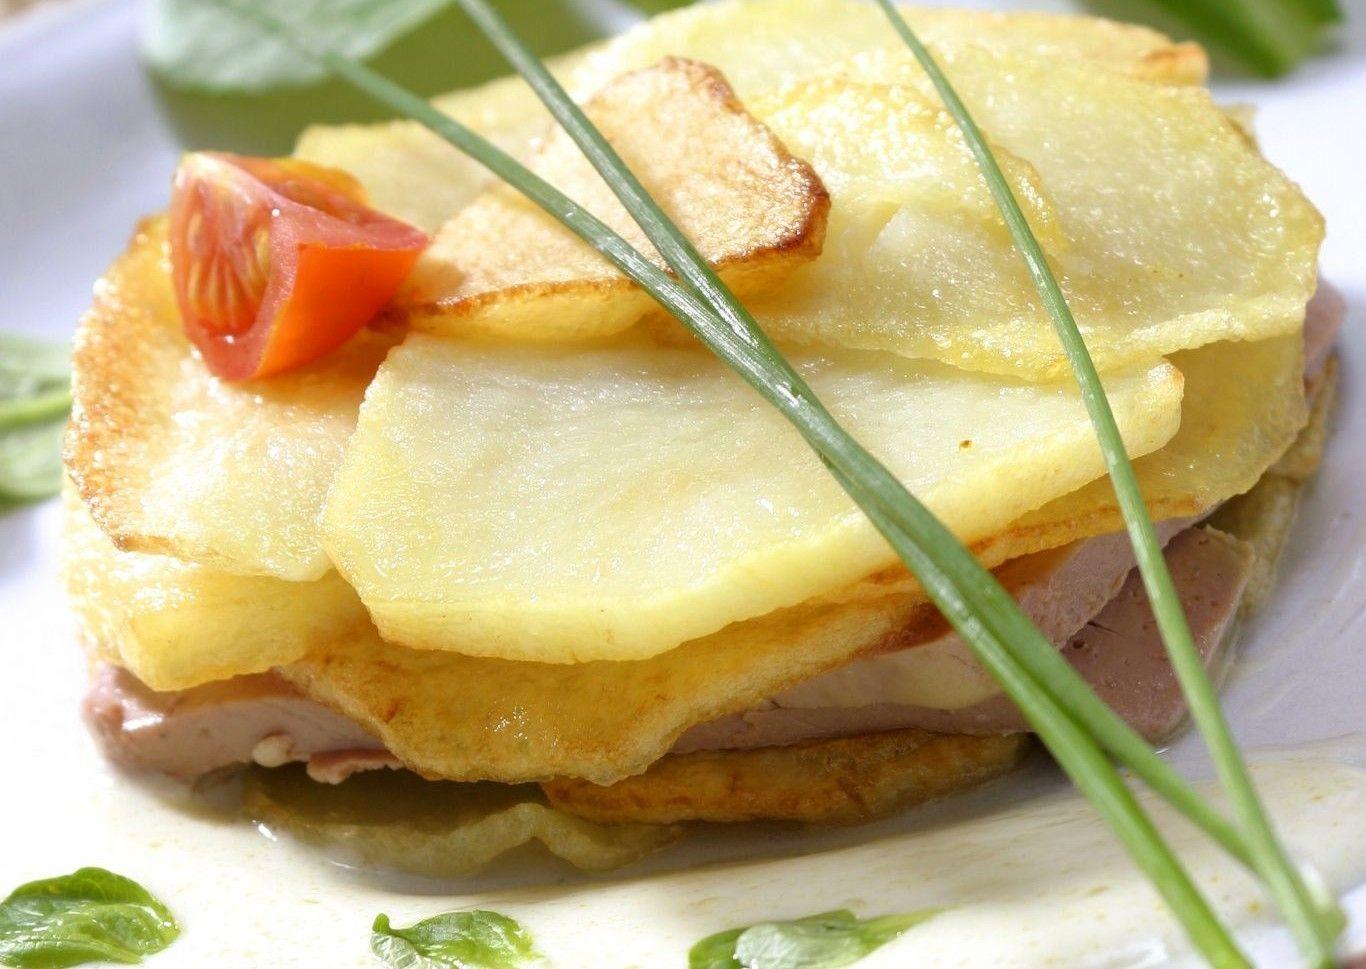 Patata Porner patatas confitadas con foie de oca